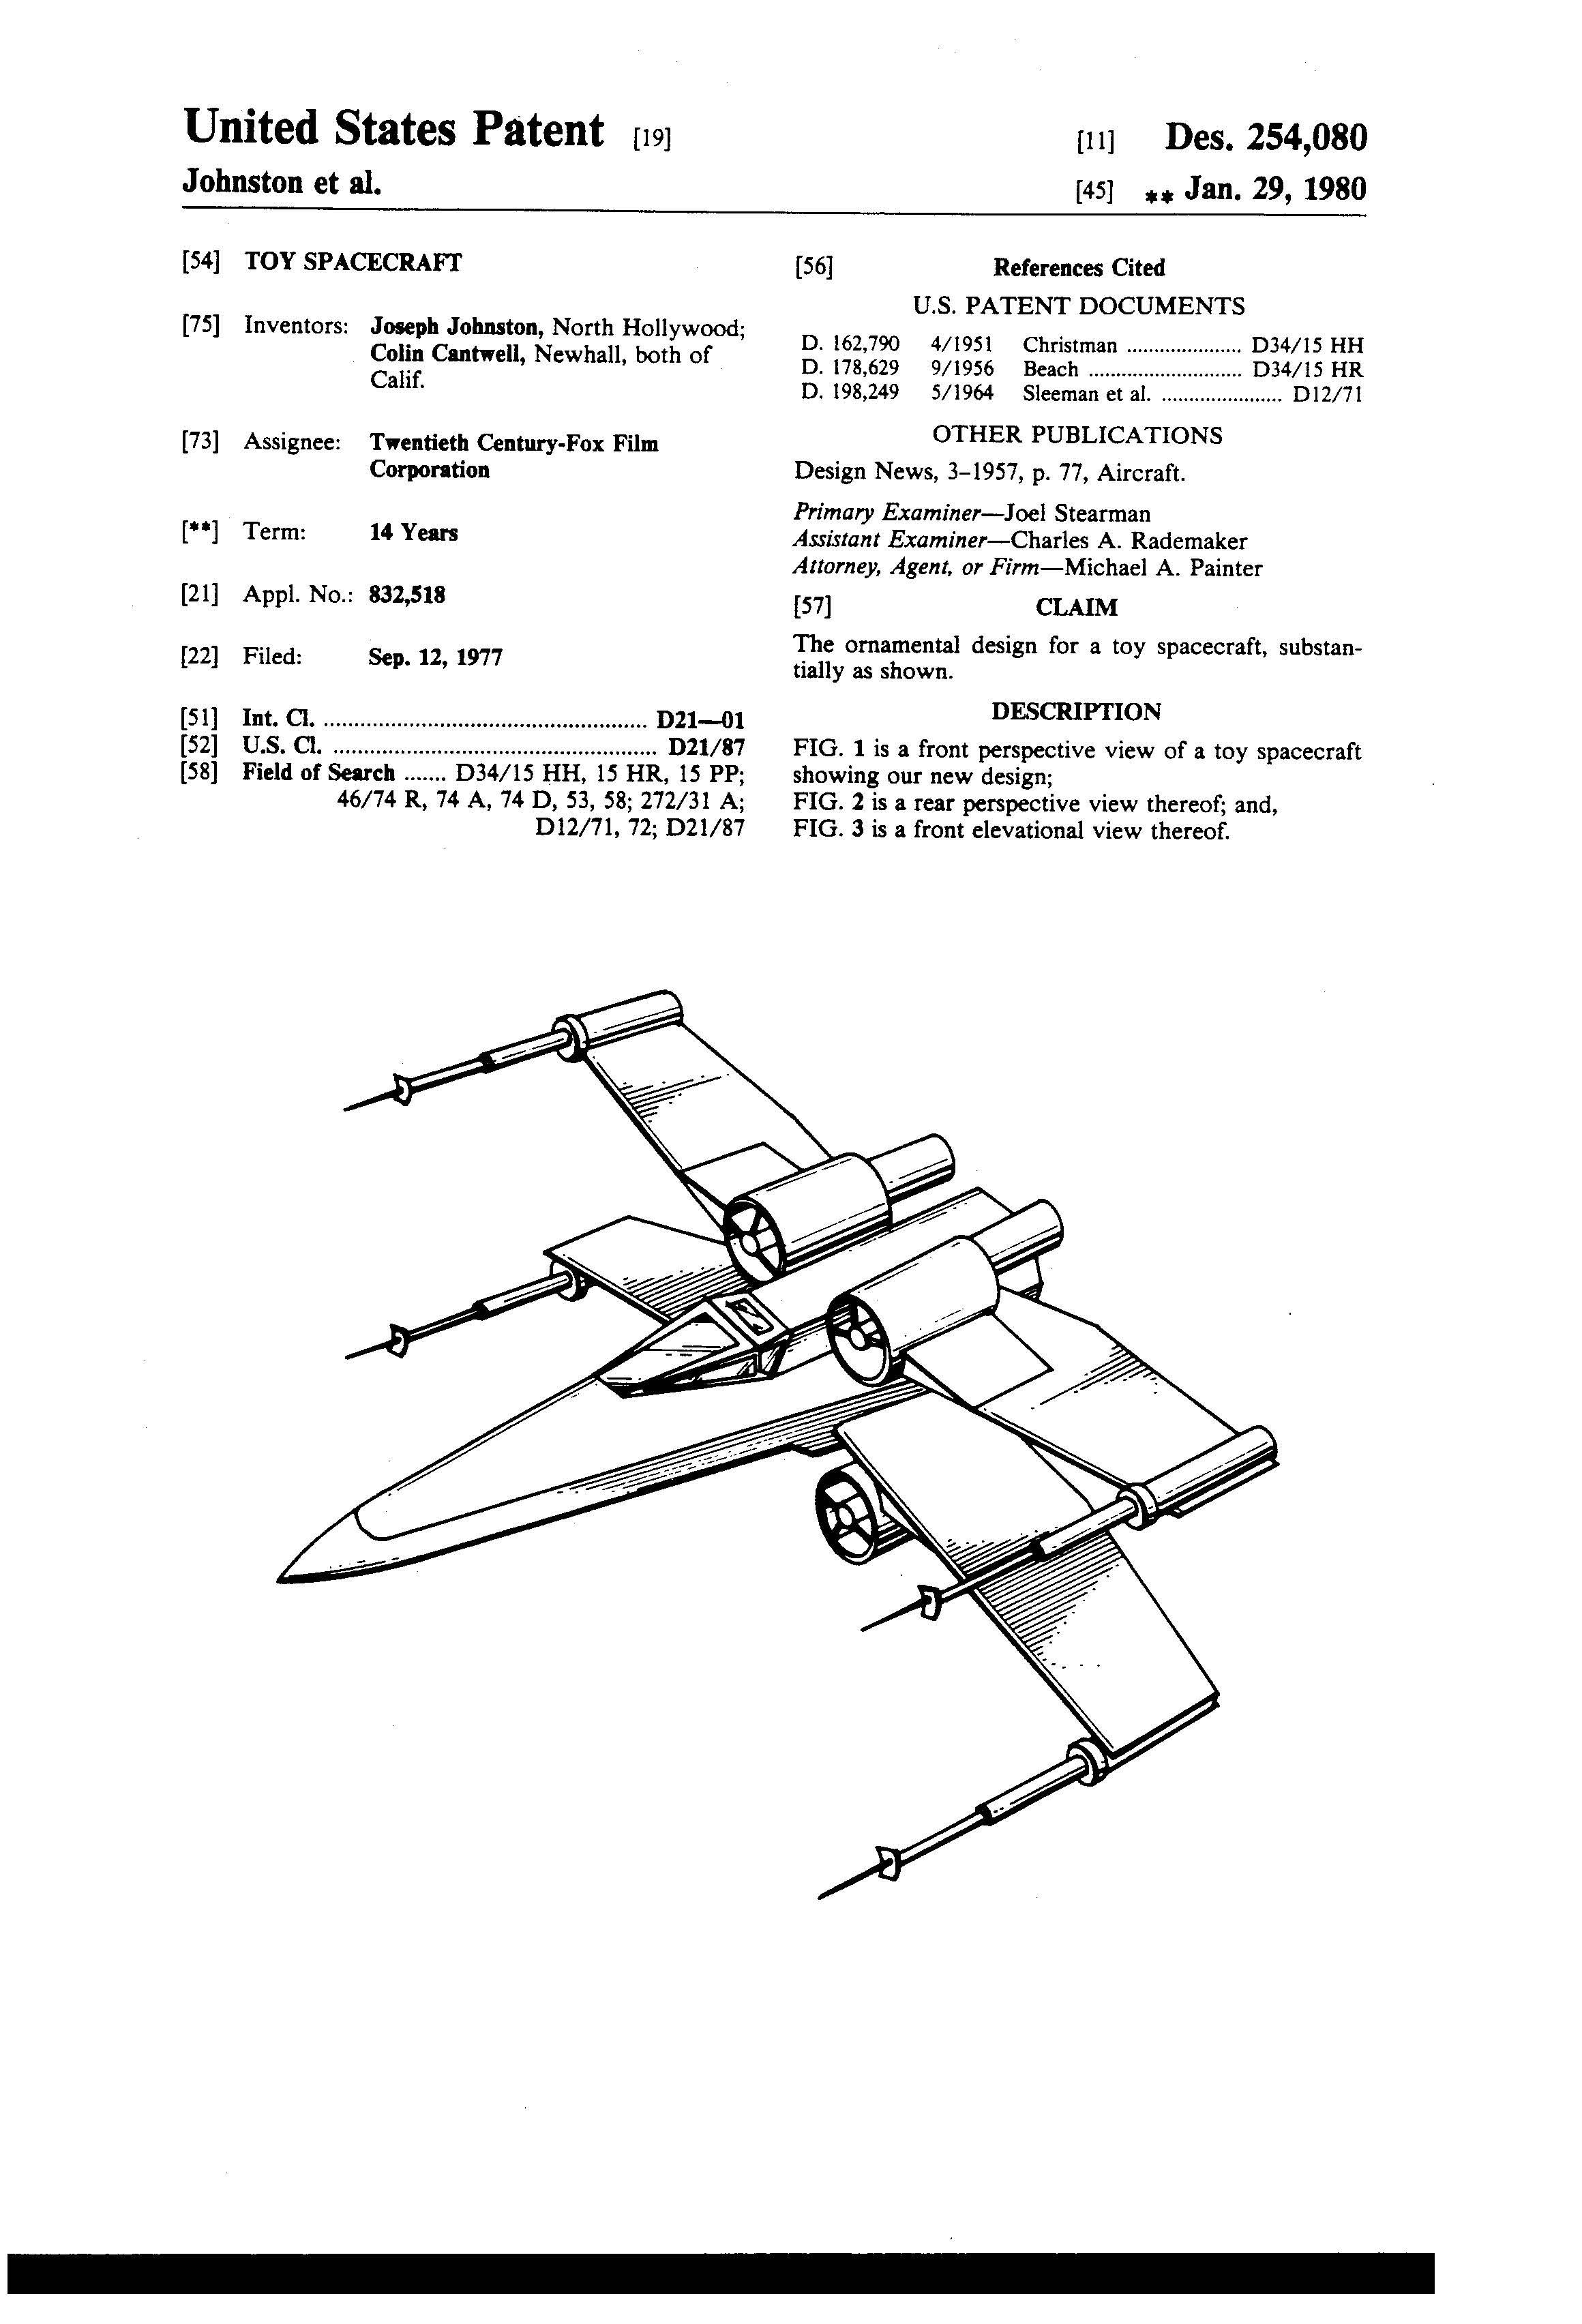 Star Wars Aircraft Patent